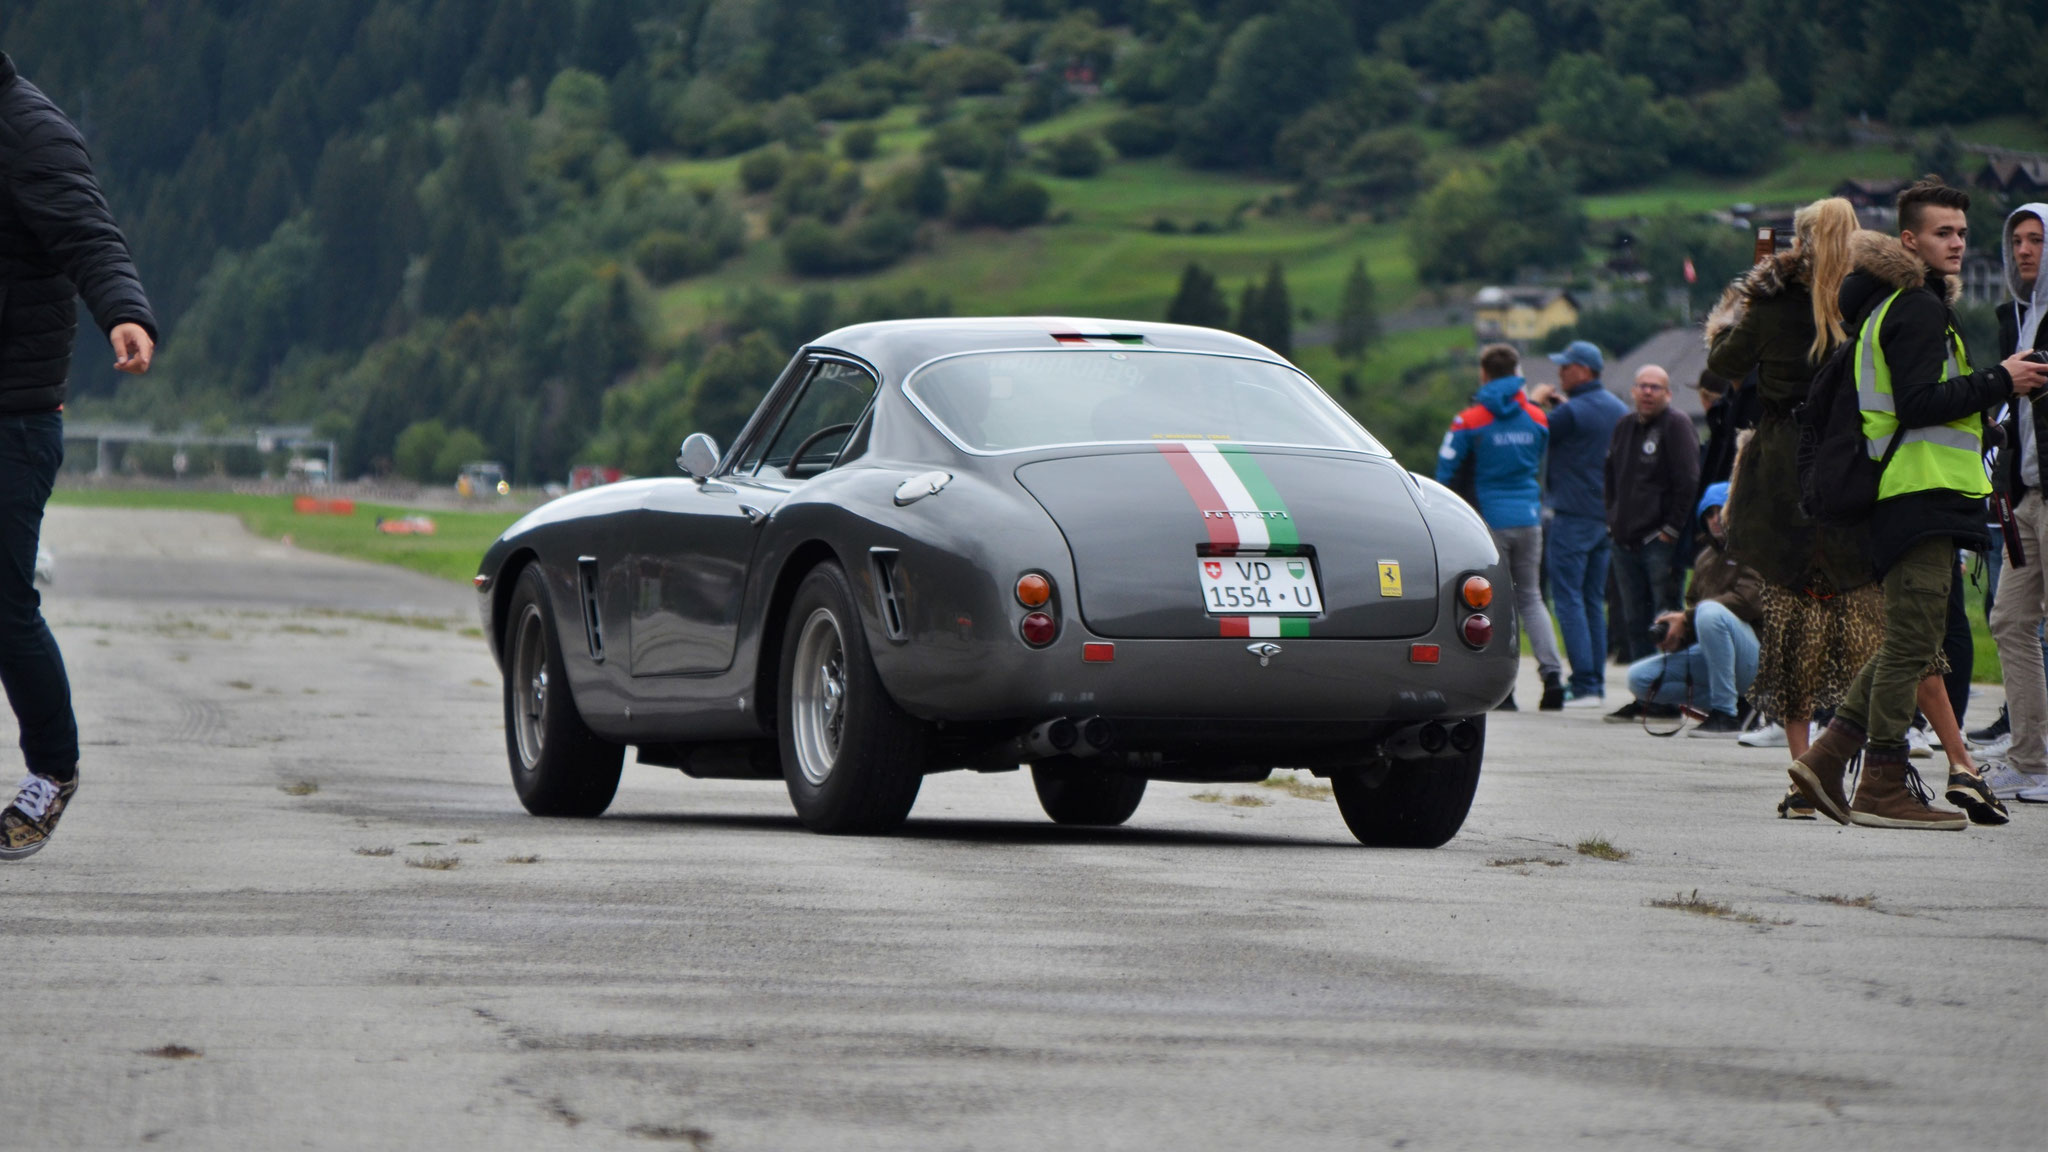 Ferrari 250 GT SWB - VD-1554-U (CH)